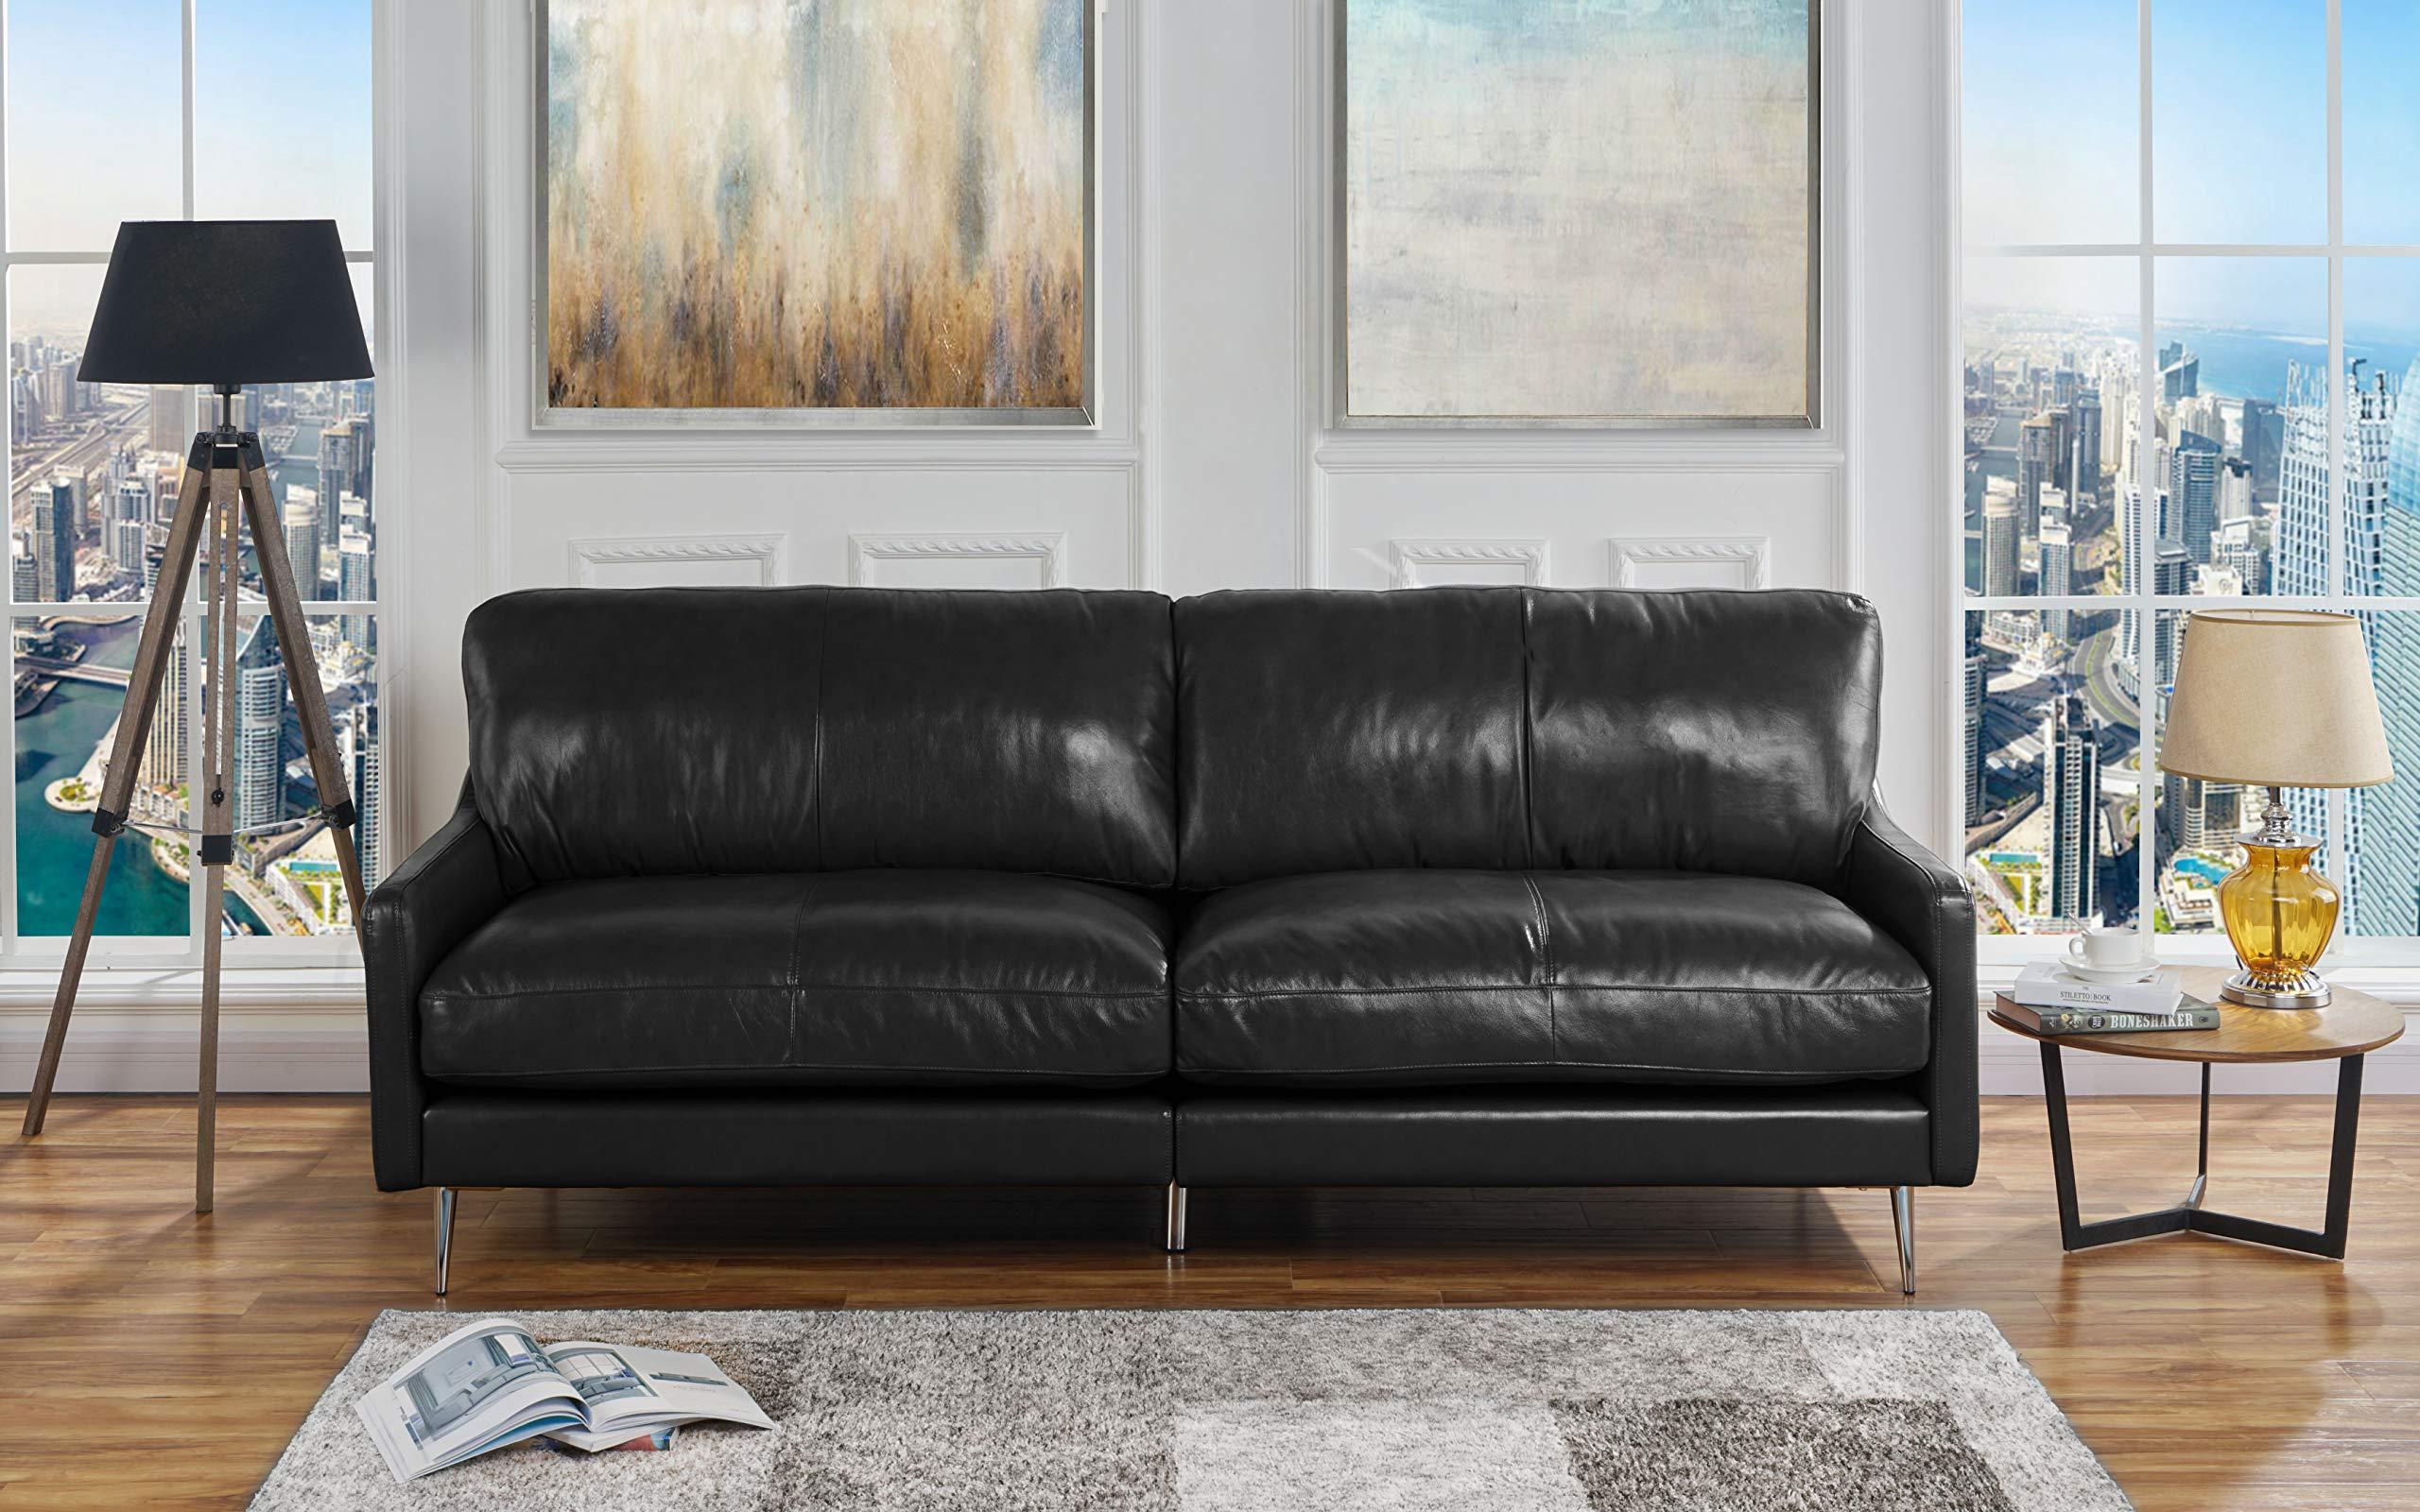 Mid Century Modern Plush Leather Living Room Sofa (Black) by Casa Andrea Milano